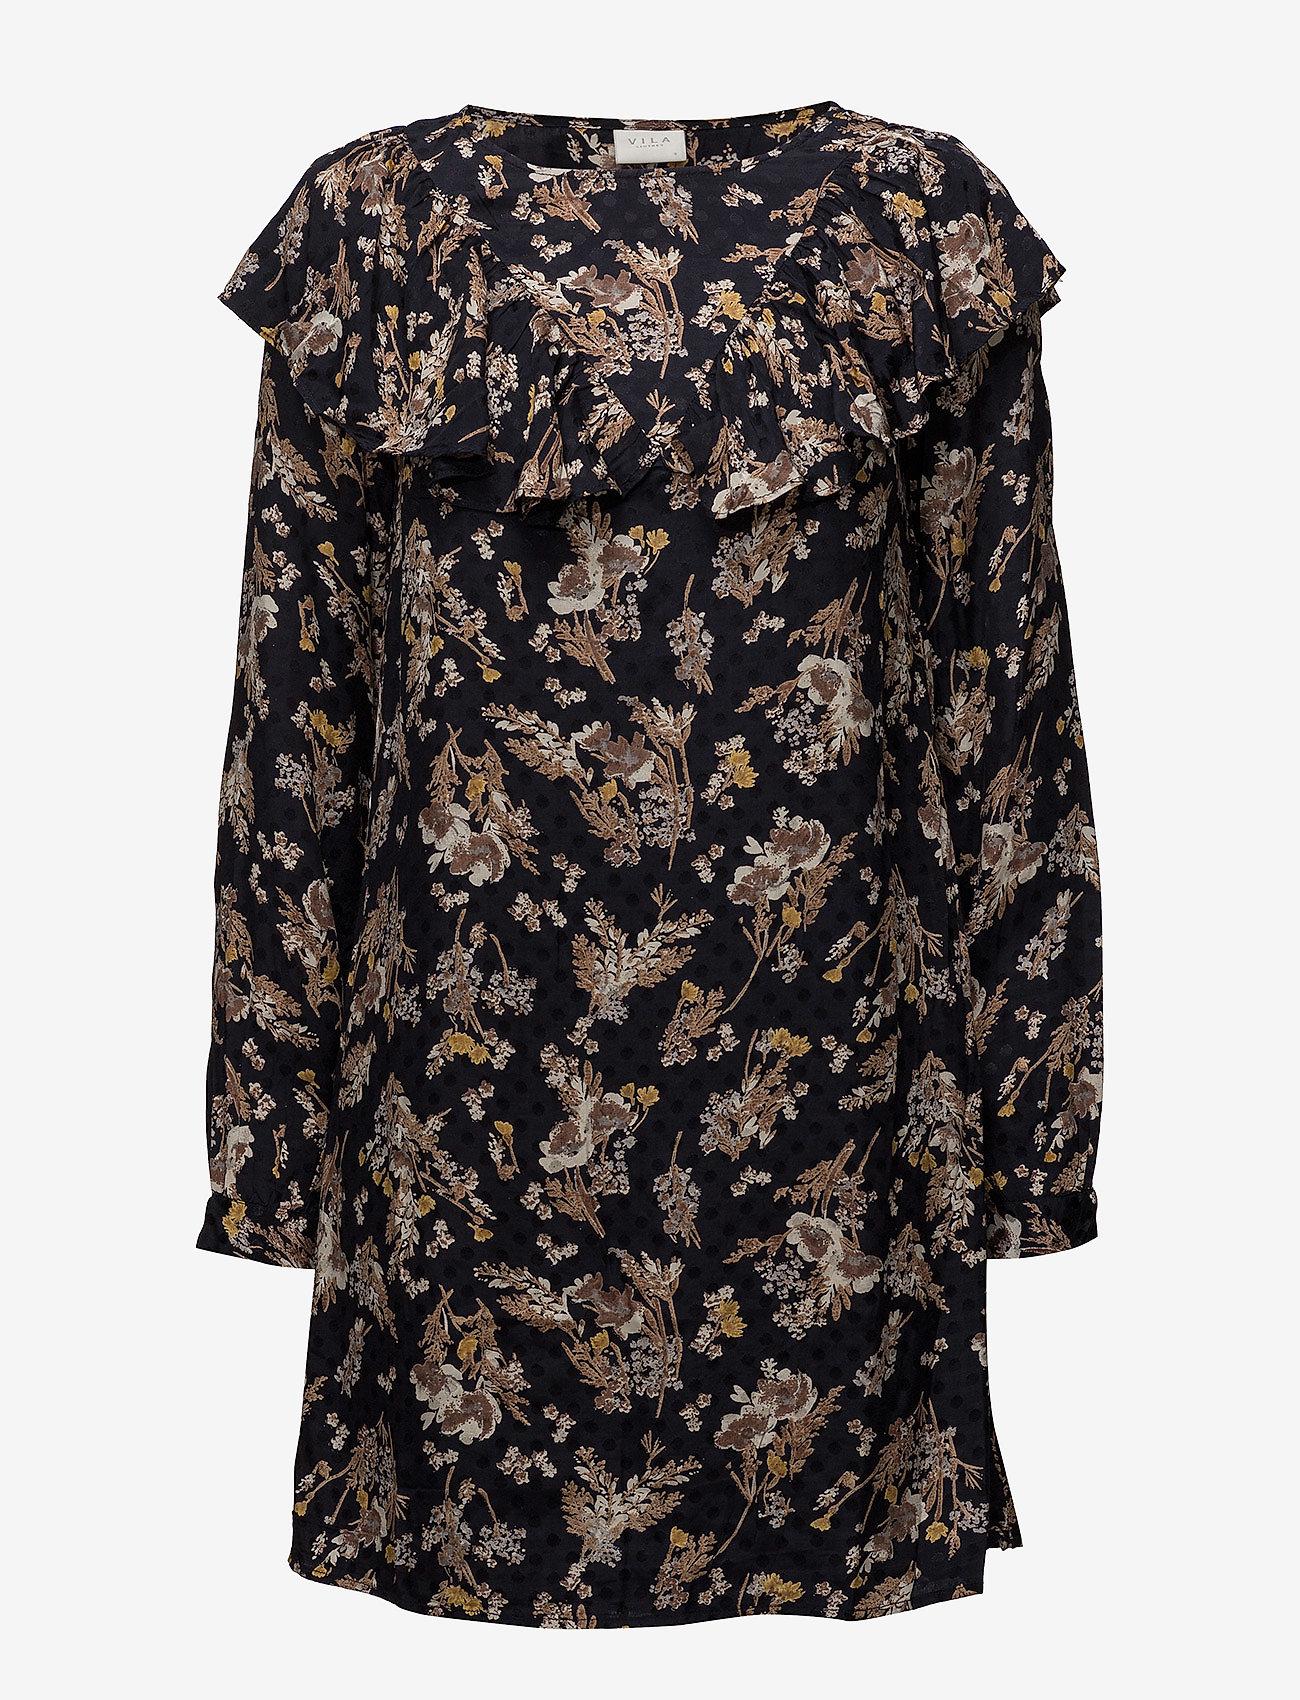 Vila - VIBETH L/S SLEEVE DRESS - short dresses - total eclipse - 0